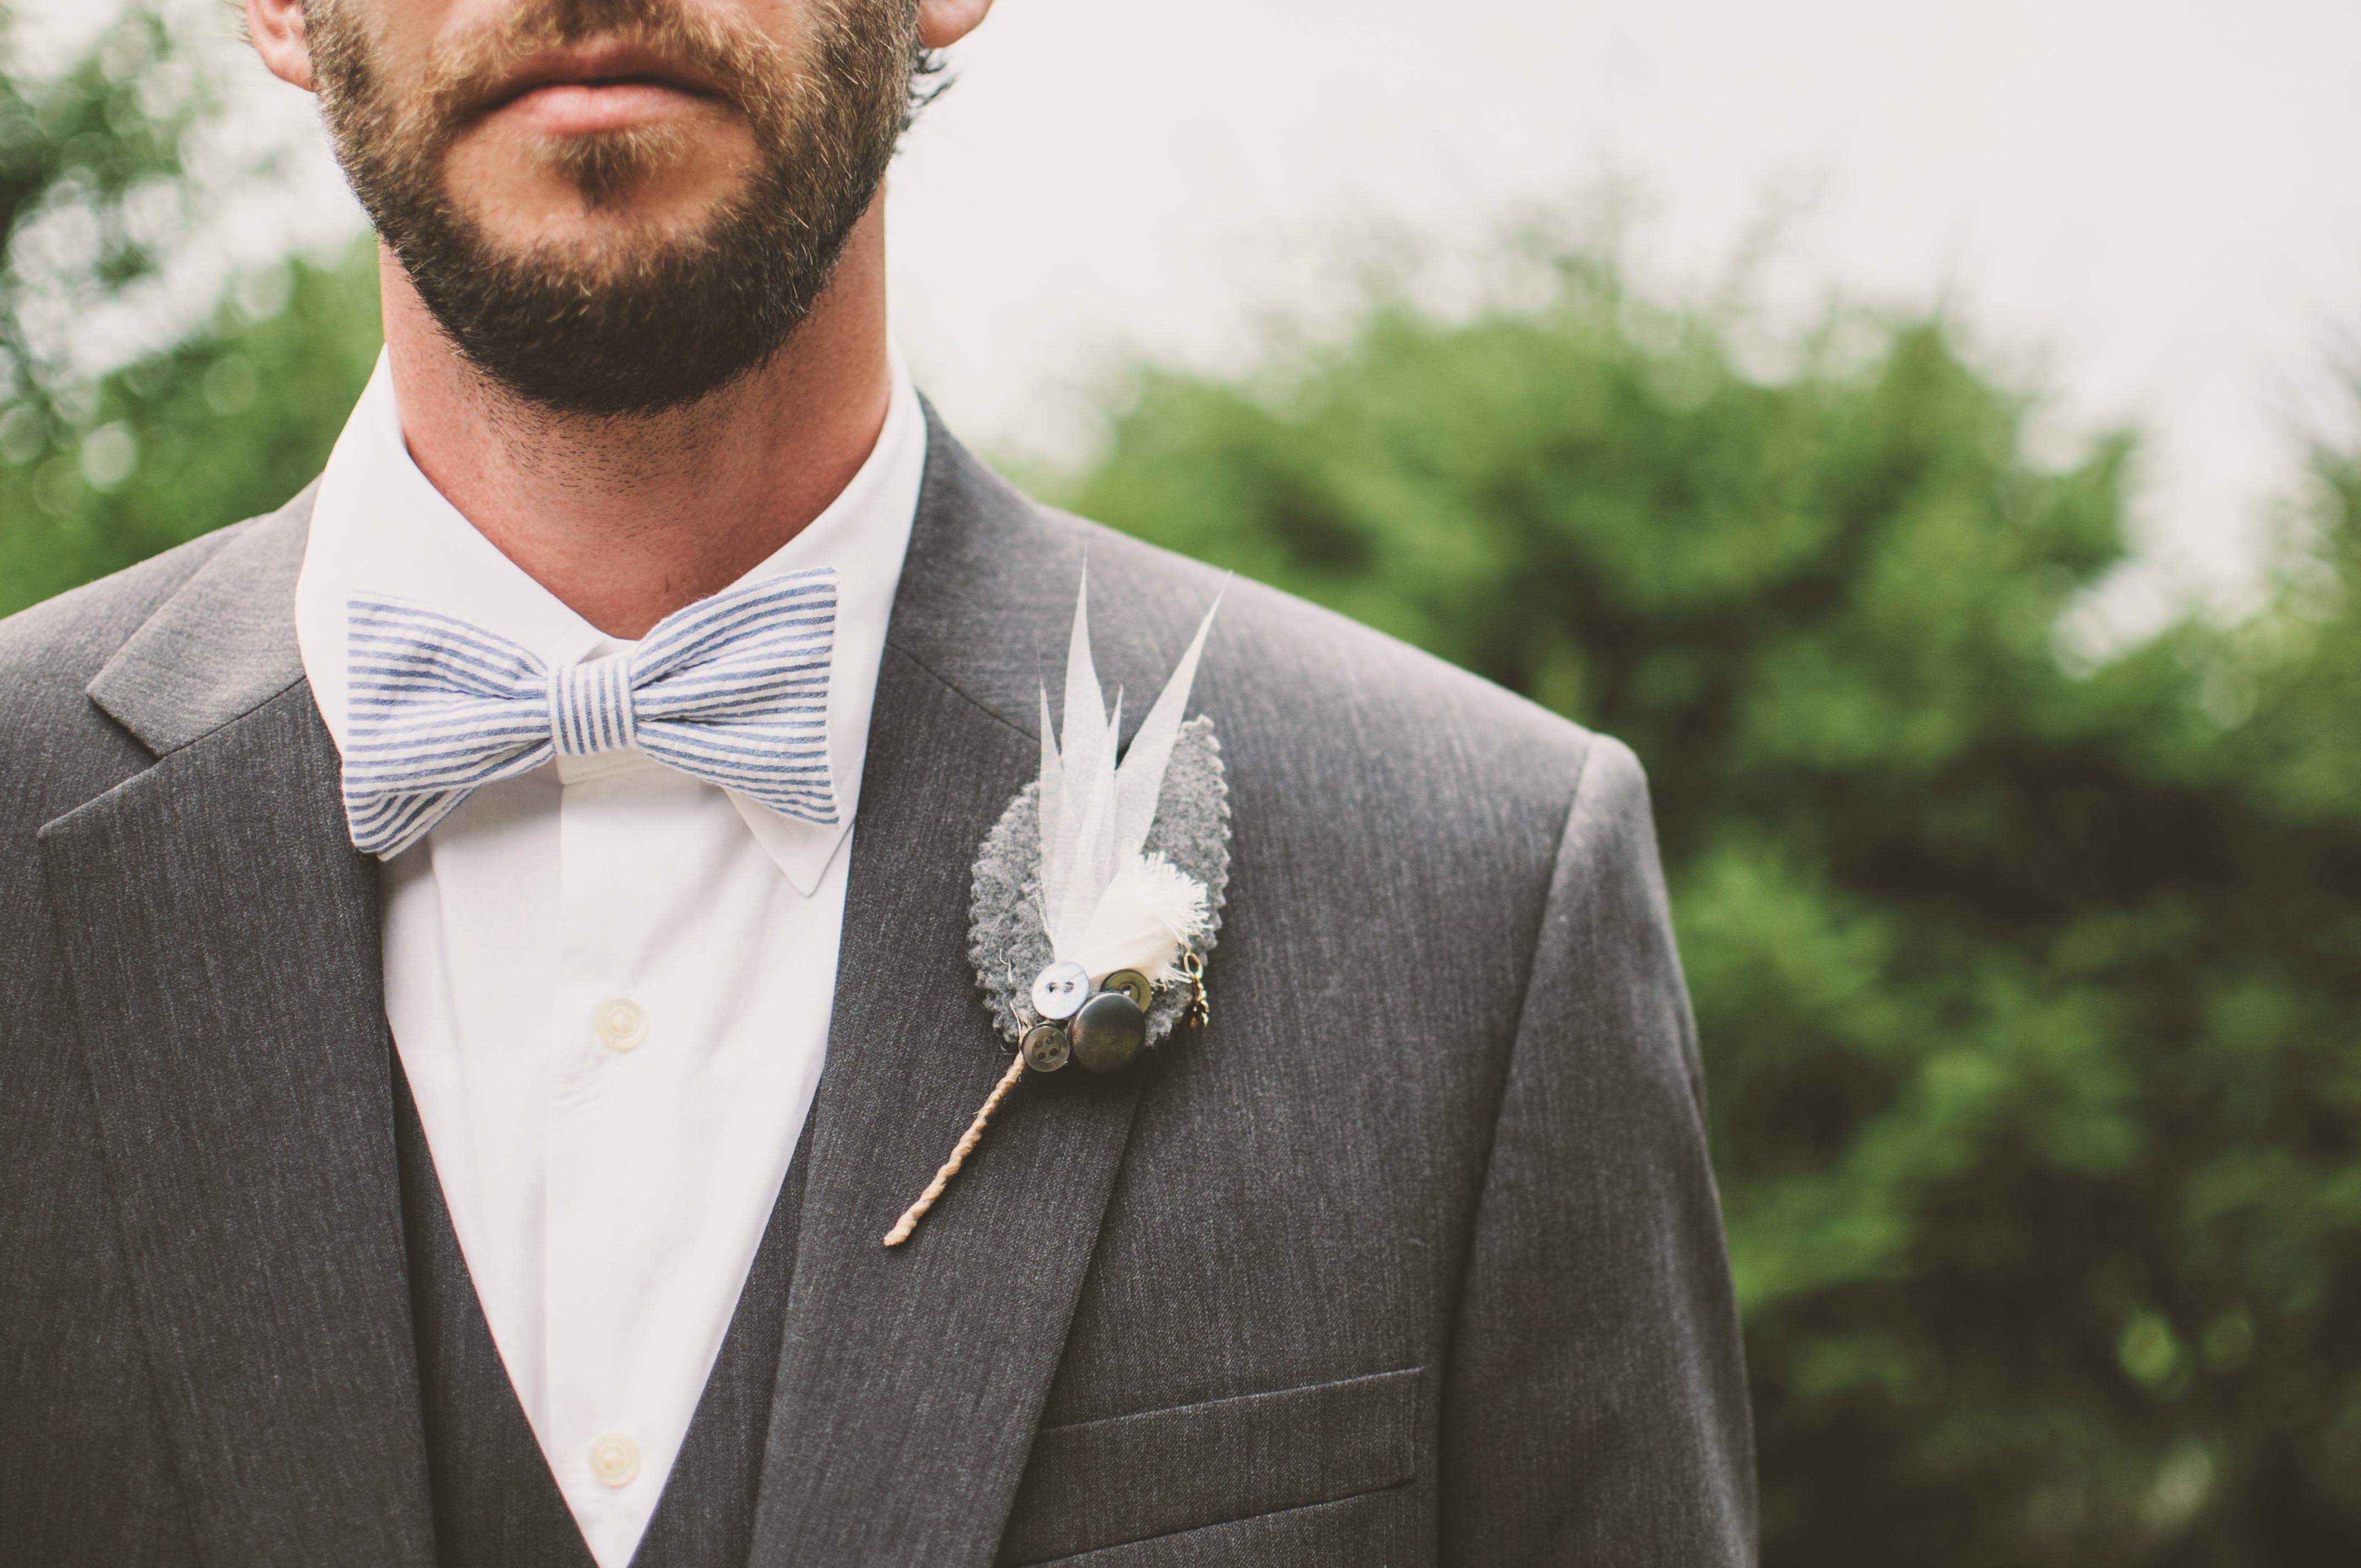 Man Wearing Gray and White Tuxedo